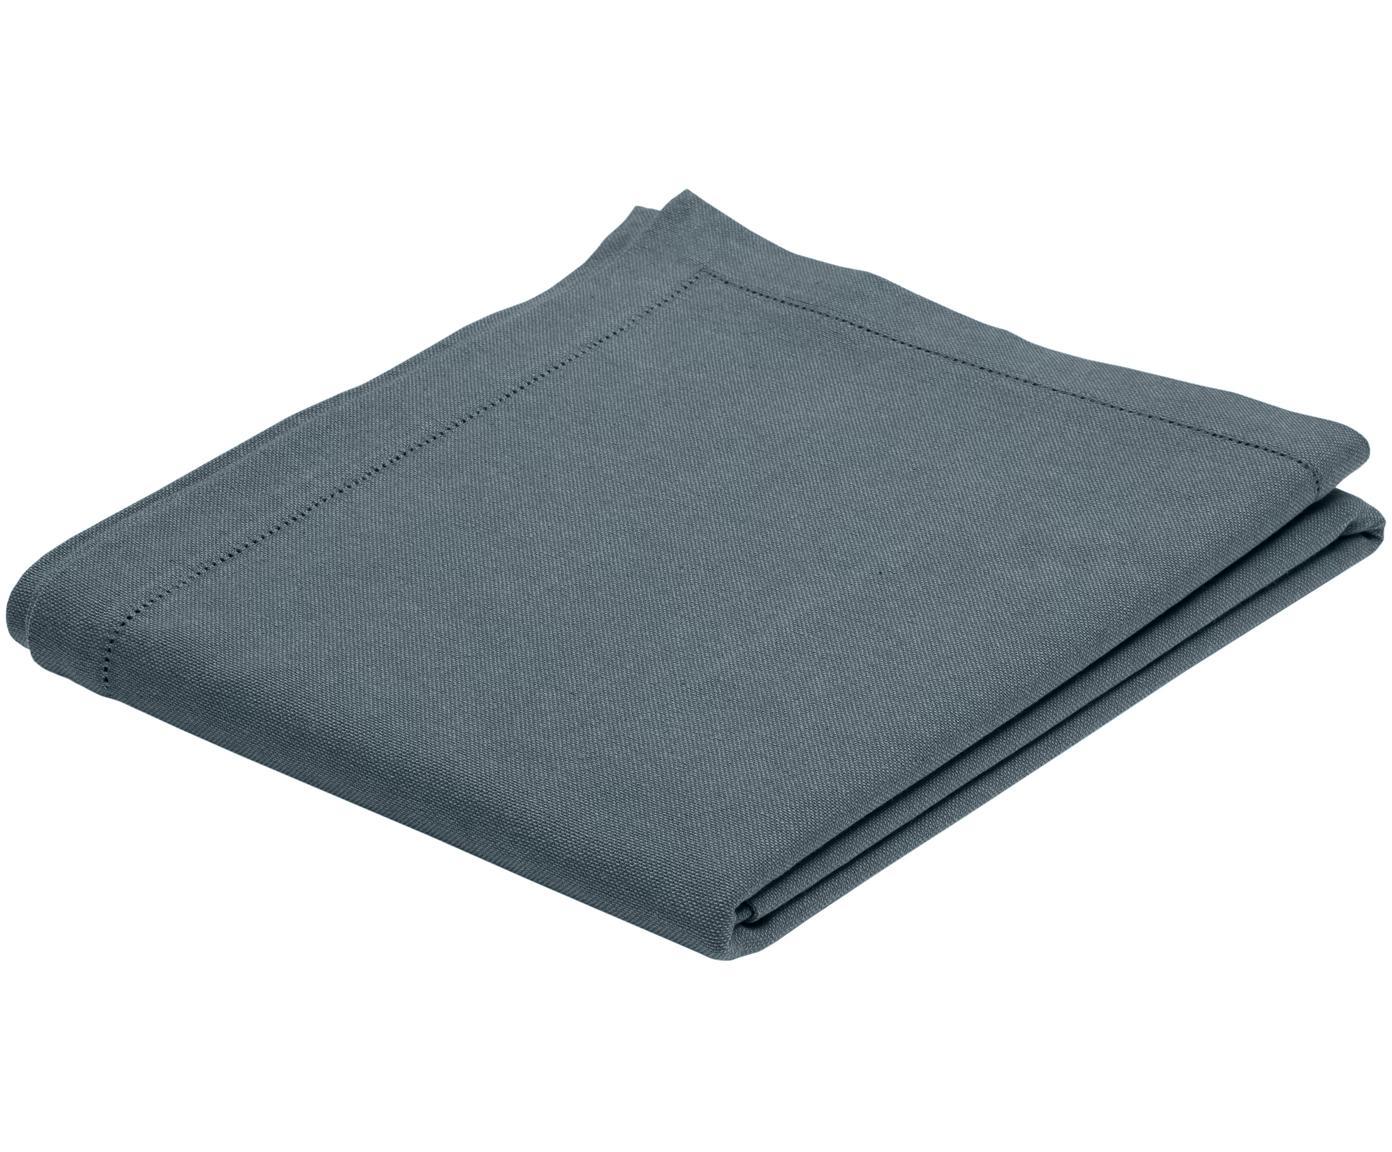 Mantel de algodón Indi, Algodón, Gris oscuro, De 6 a 8 comensales (An 140 x L 250 cm)